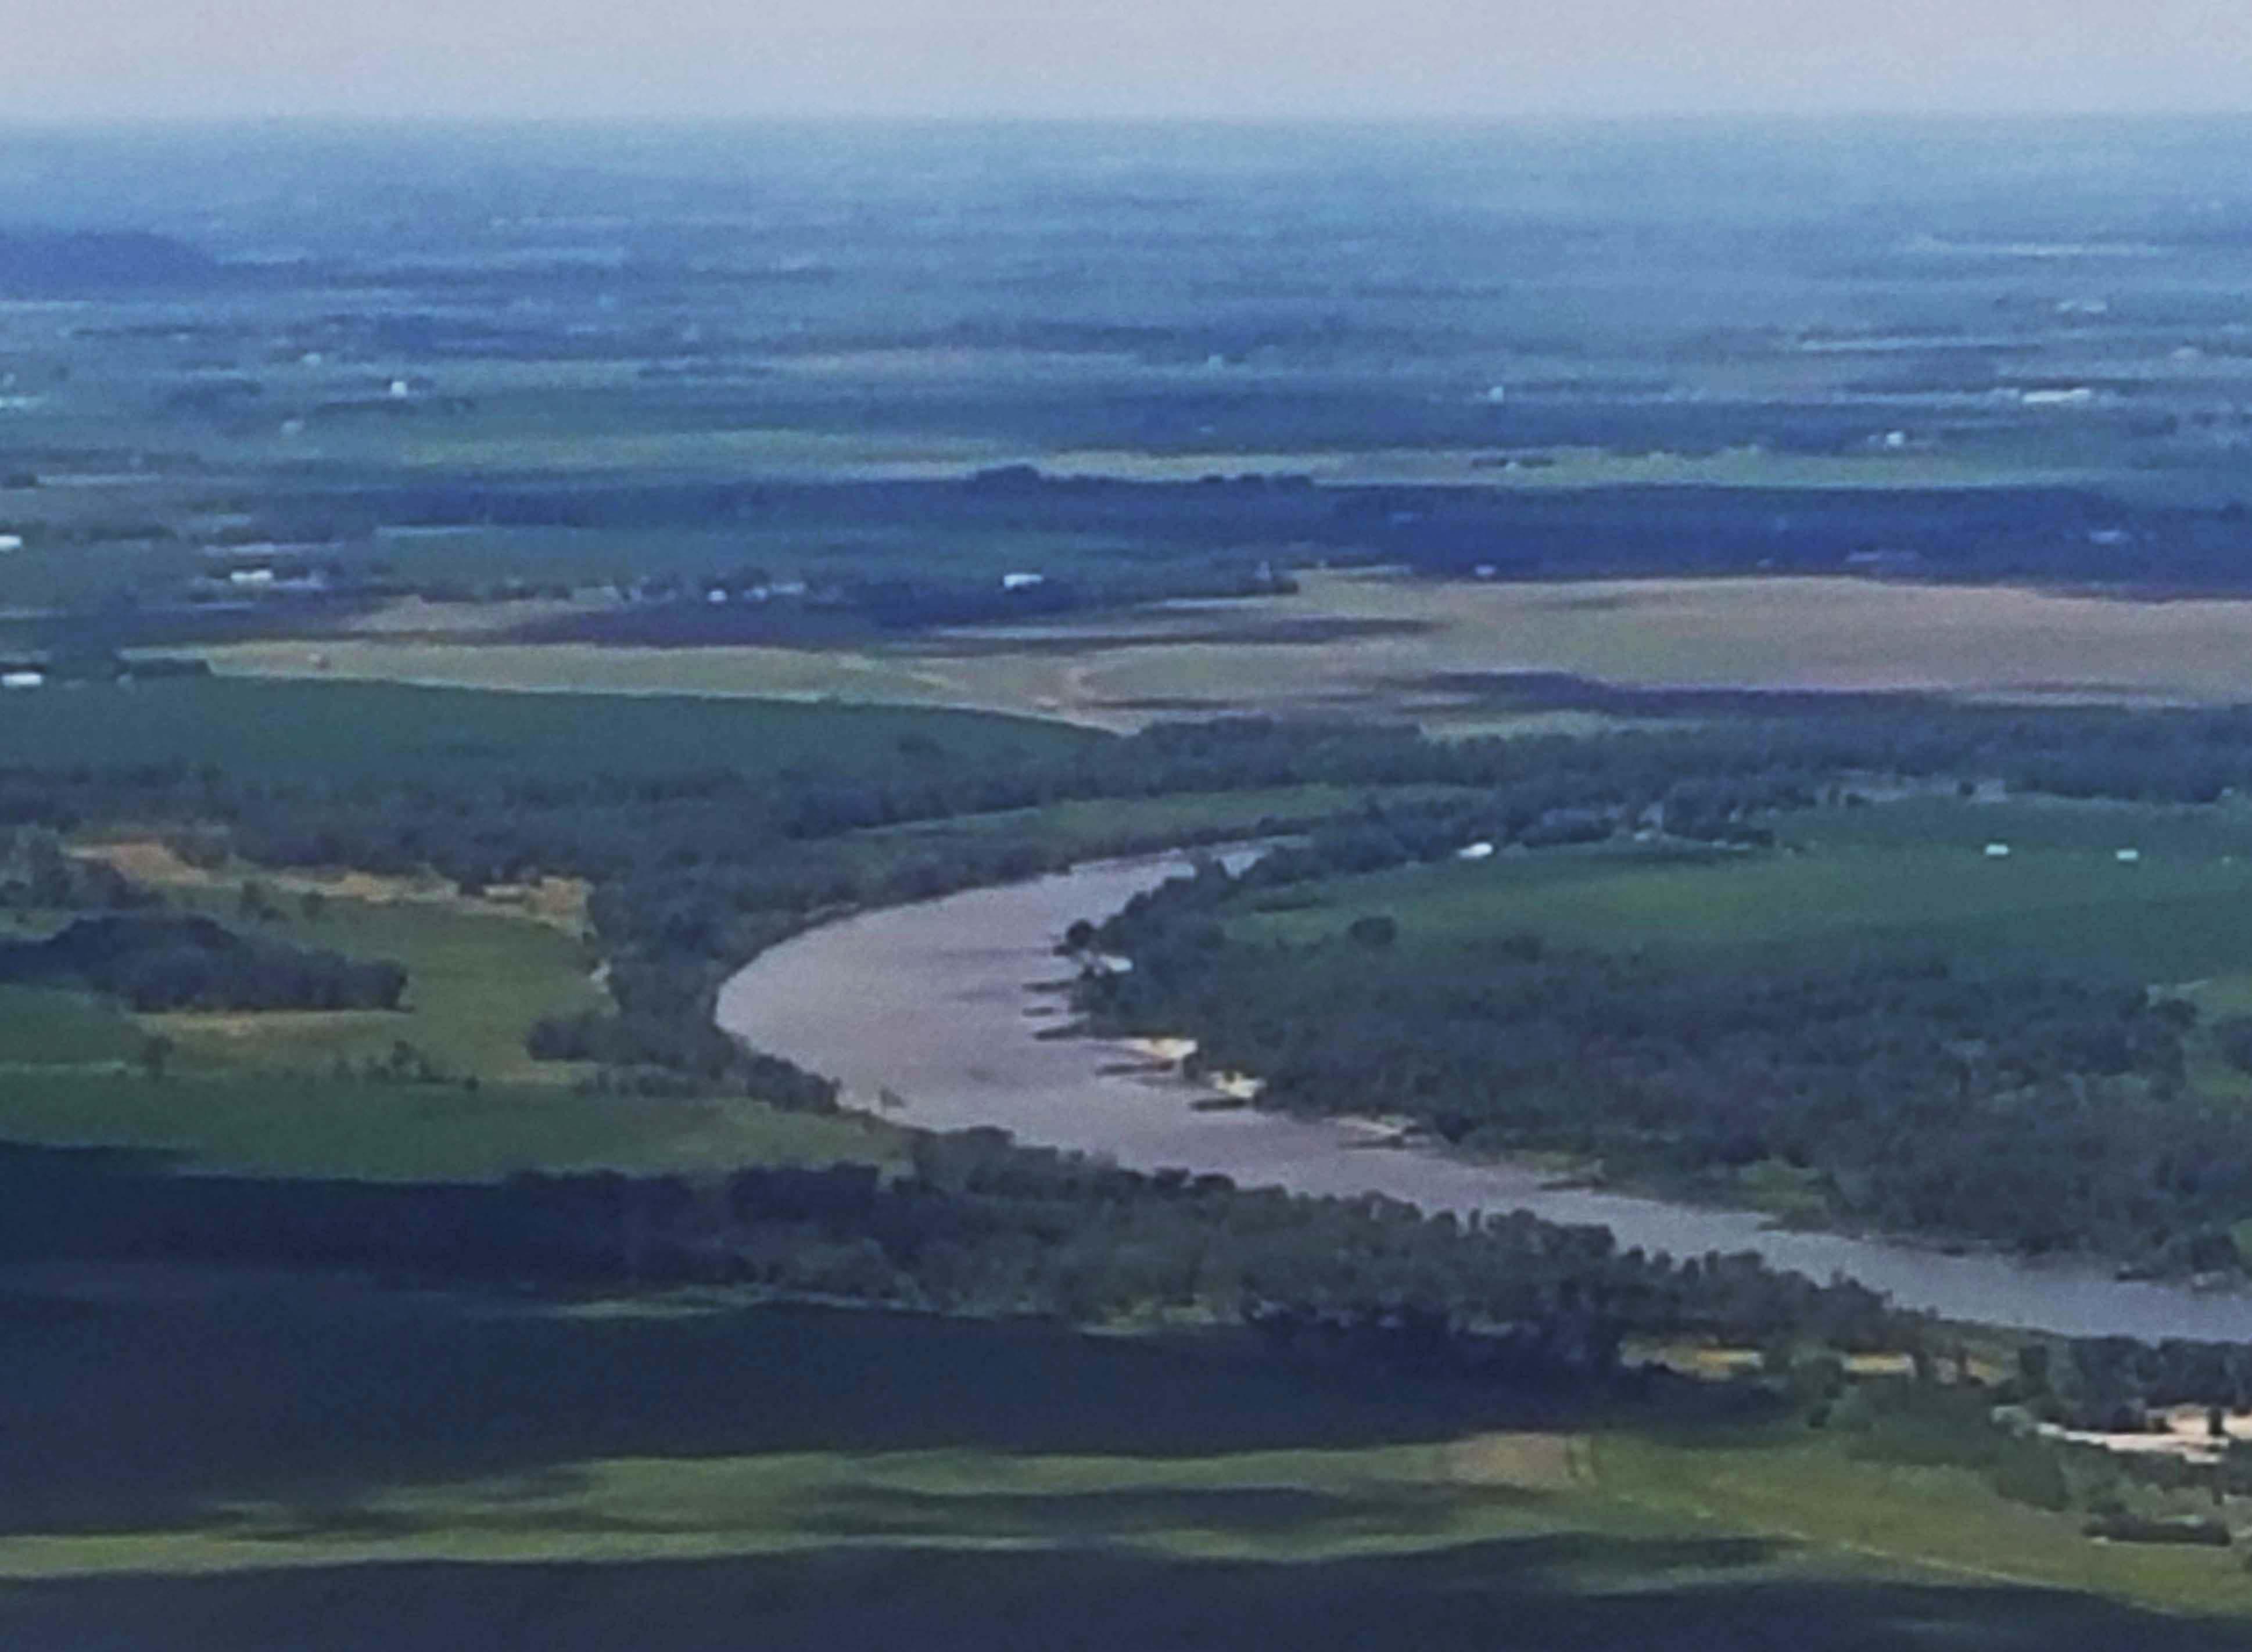 Quick trip to Iowa - Missouri River